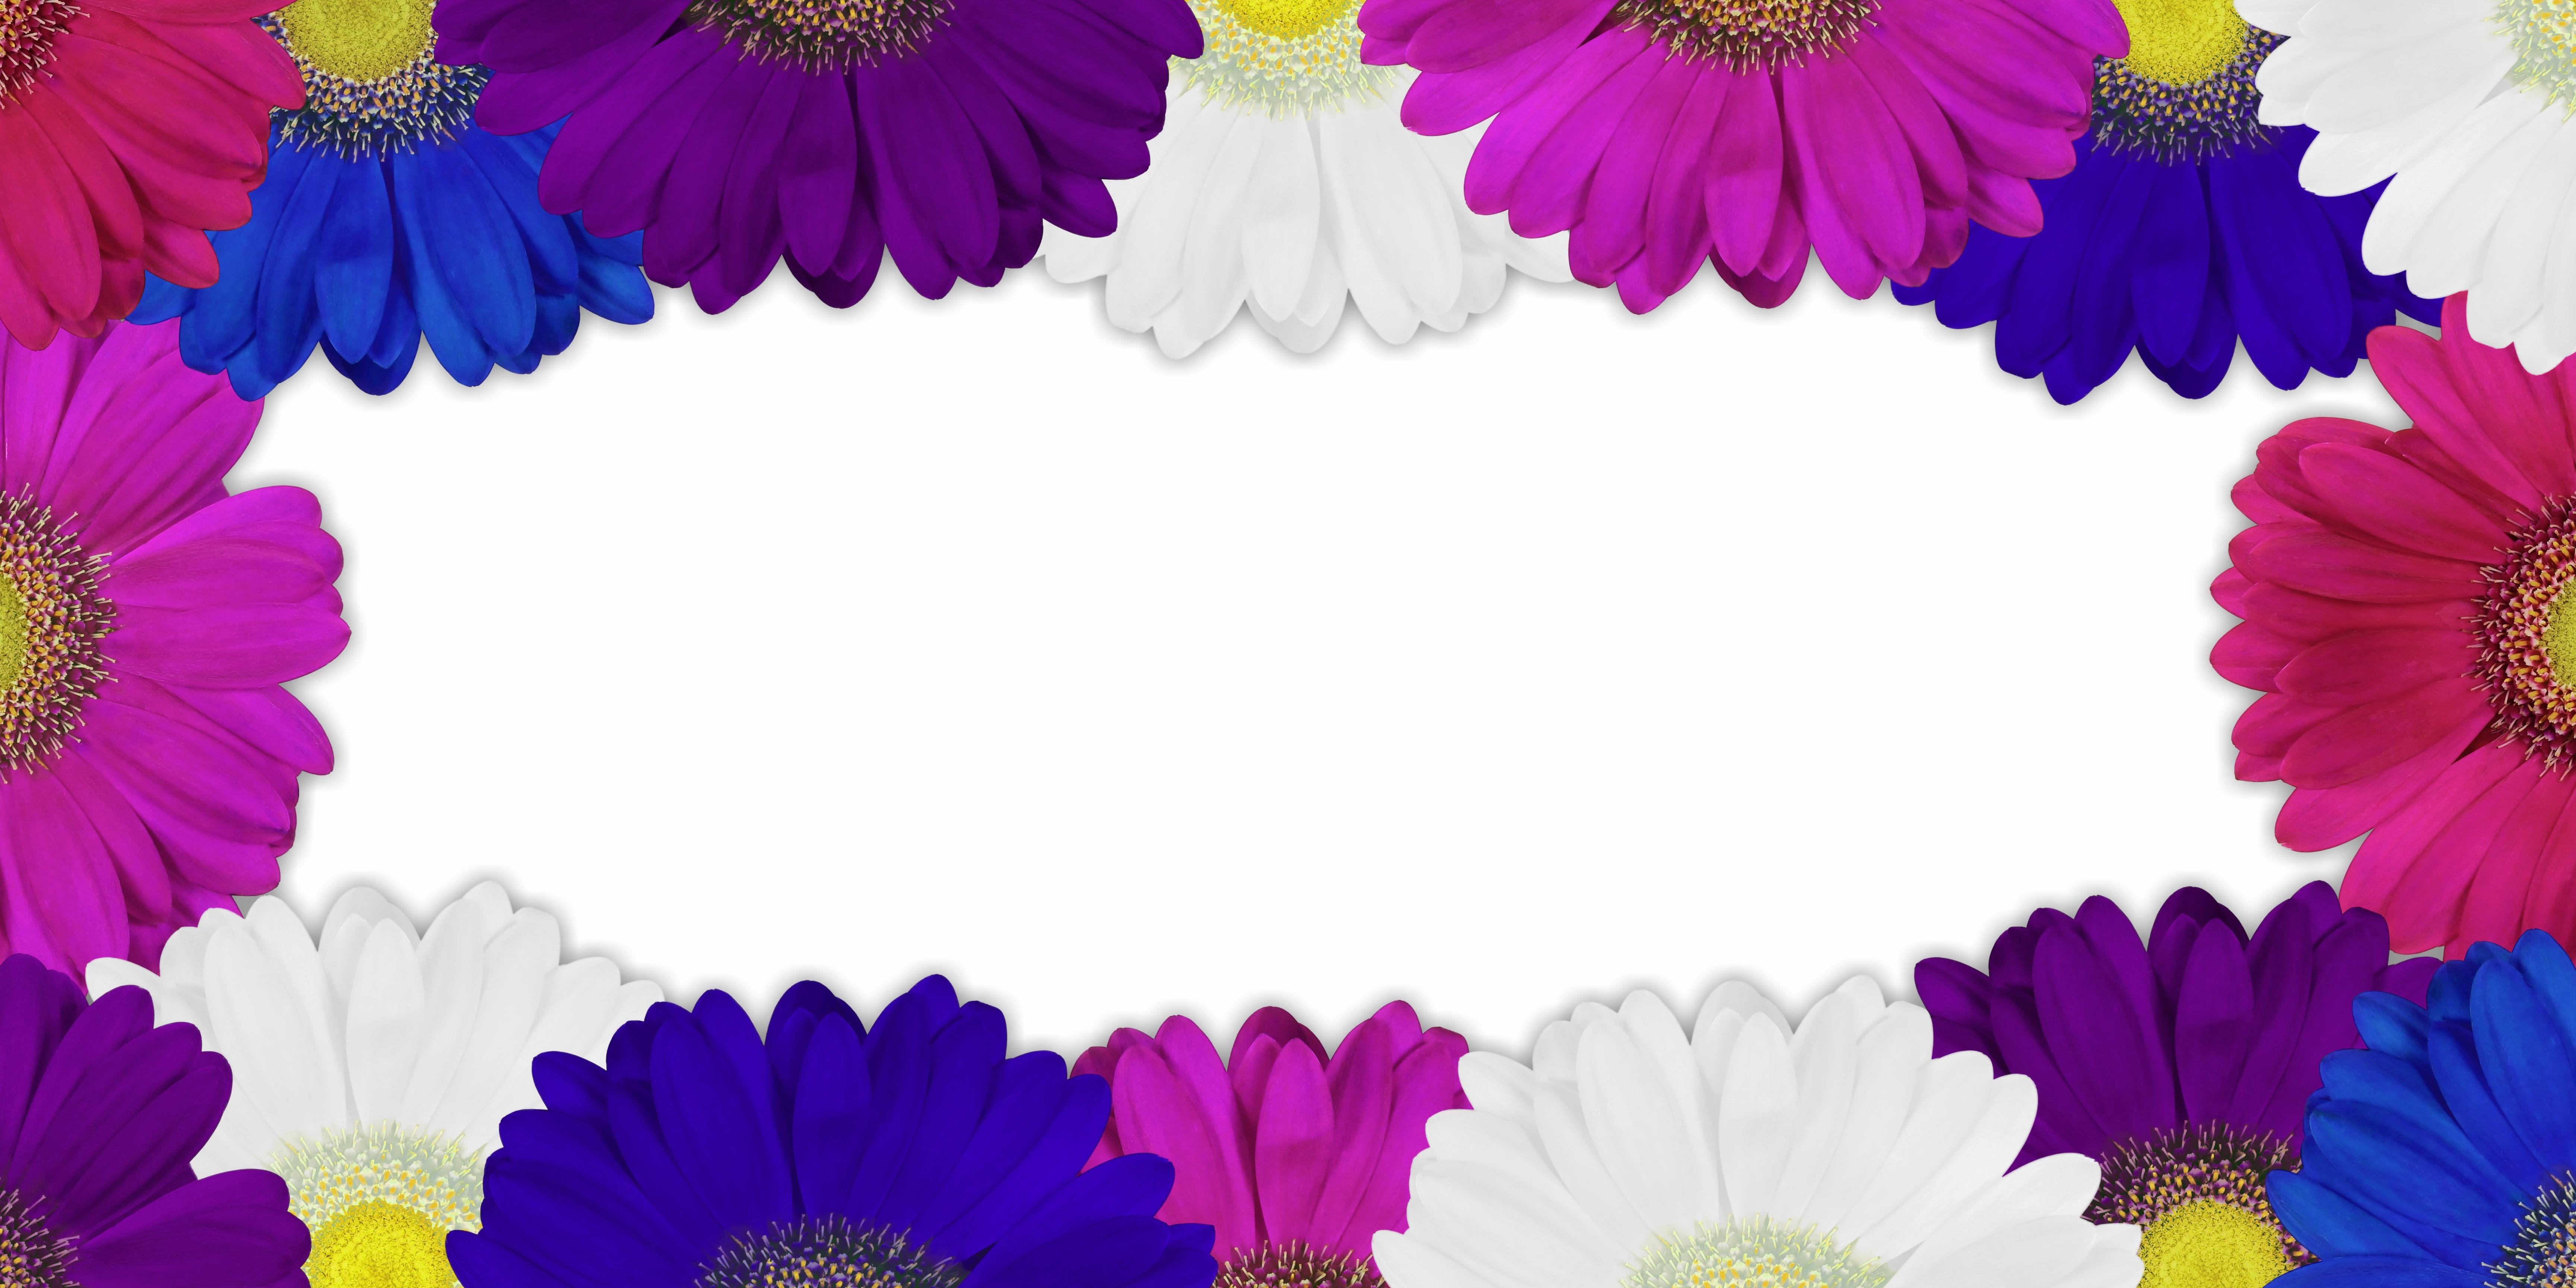 Free nature blossom plant flower purple petal bloom